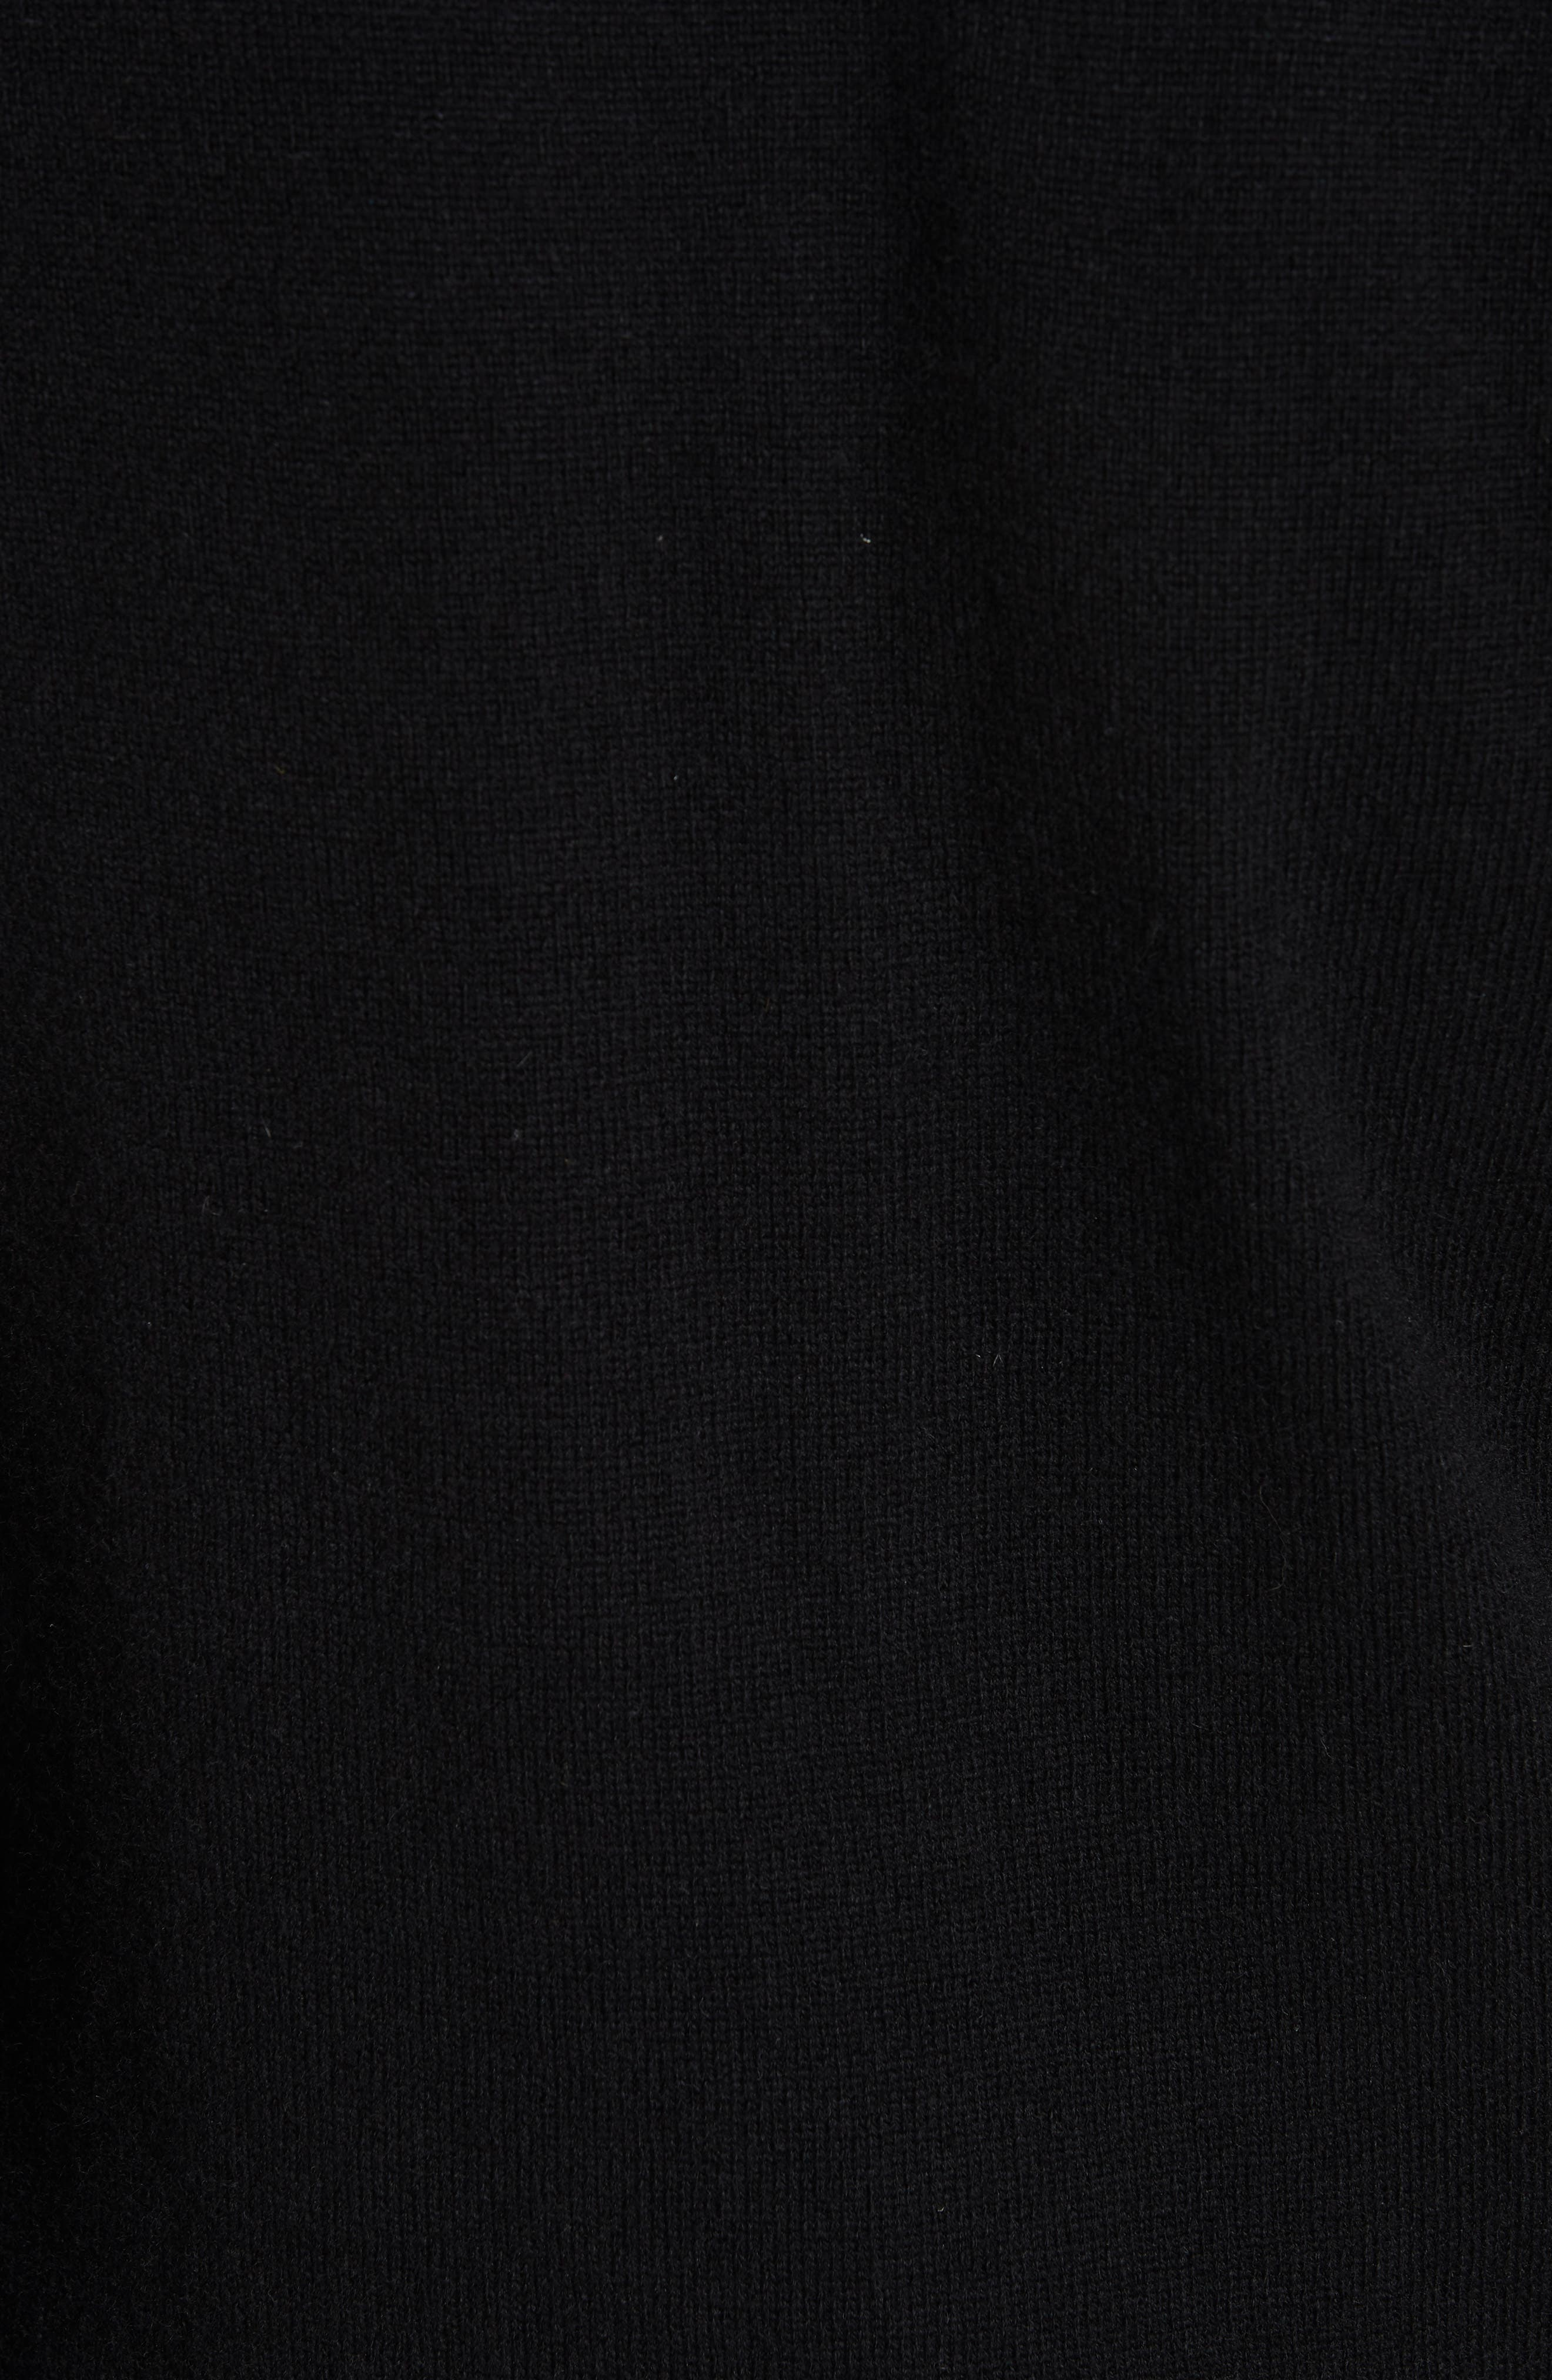 PLAY Wool Cardigan,                             Alternate thumbnail 5, color,                             BLACK